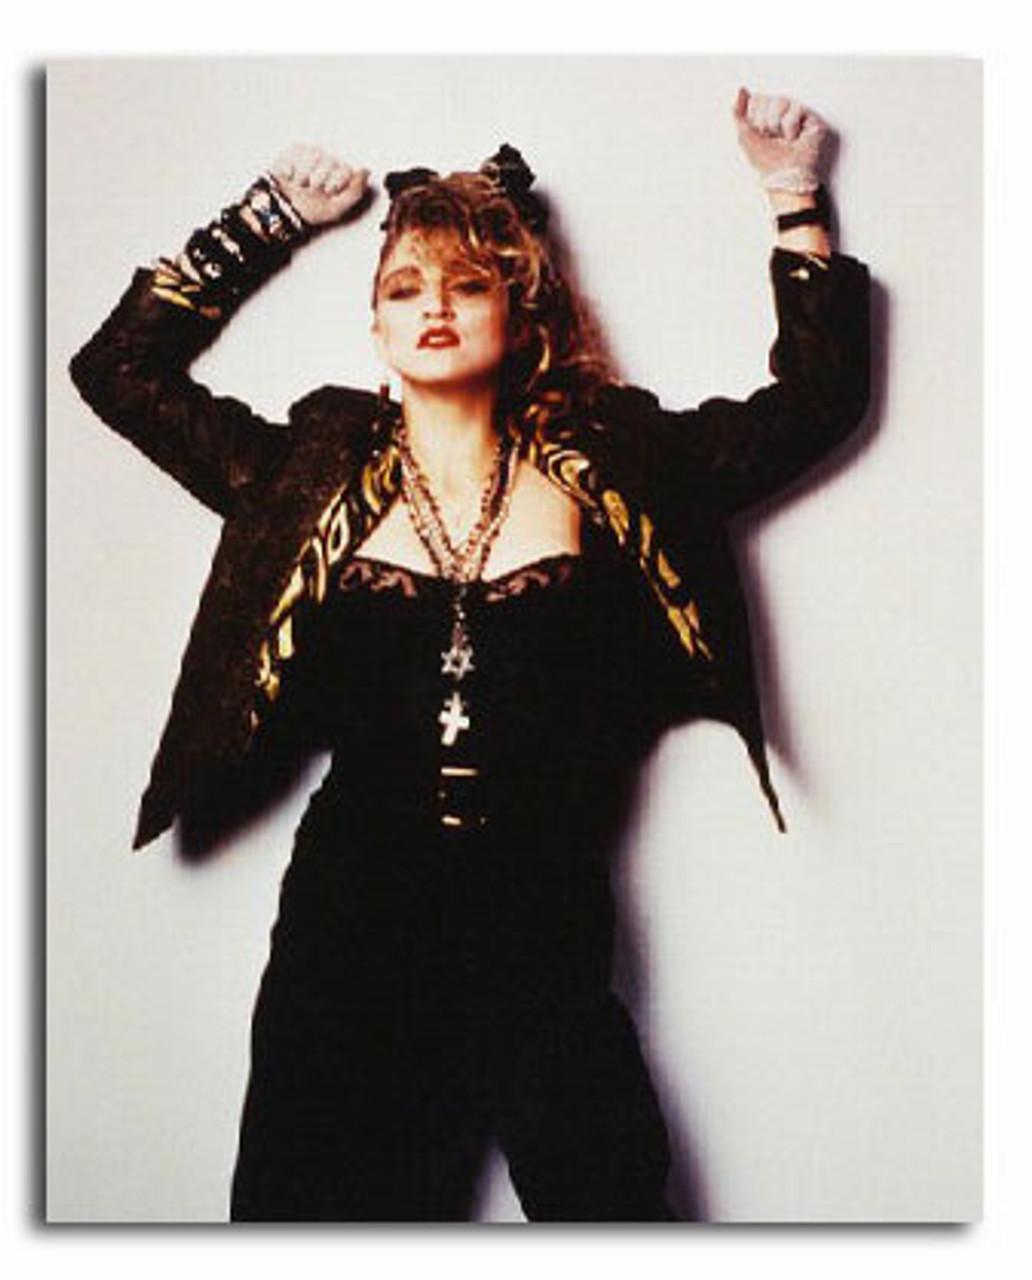 Desperately Seeking Susan  Movie Poster Film Photo Print  Picture Madonna